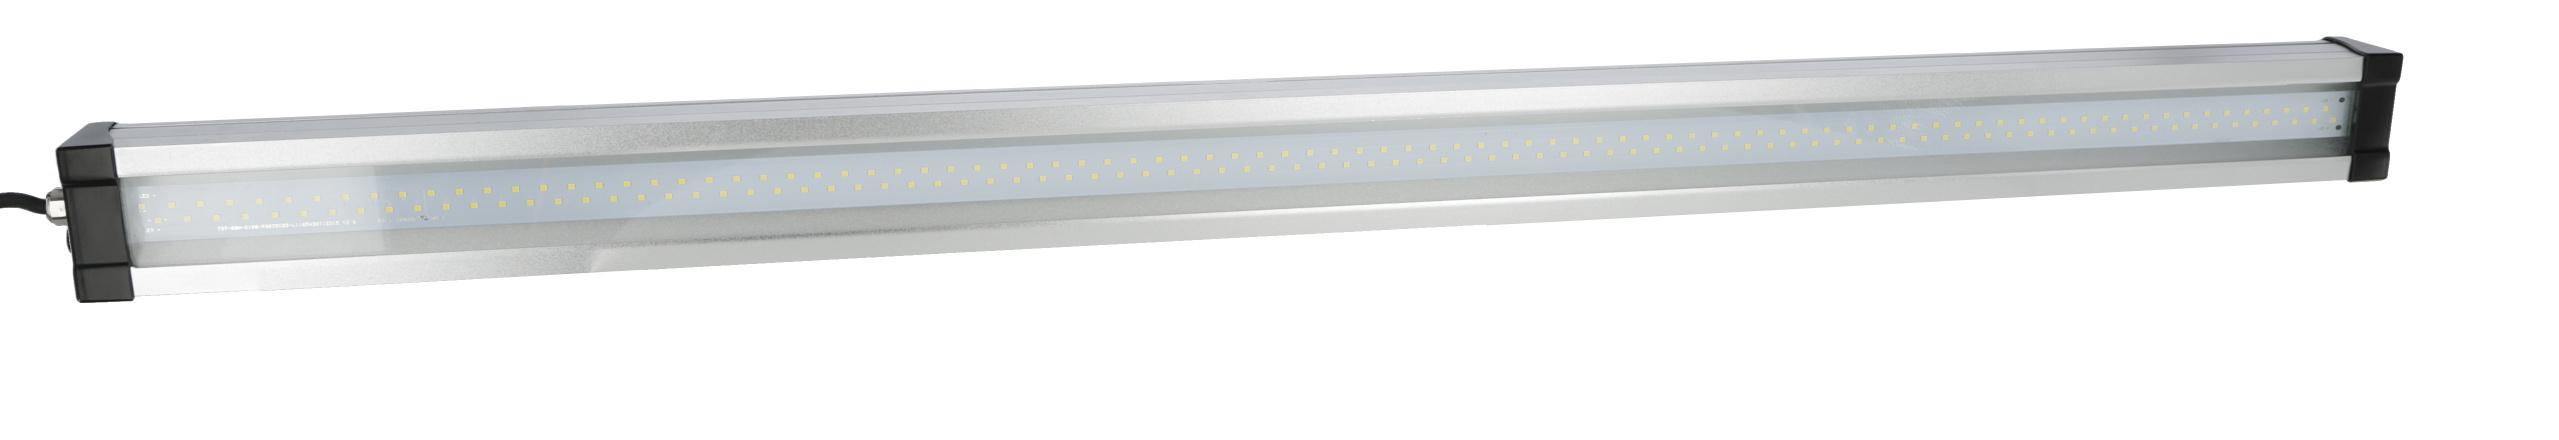 LED-Feuchtraumleuchte FarmPRO, 60W, 120cm